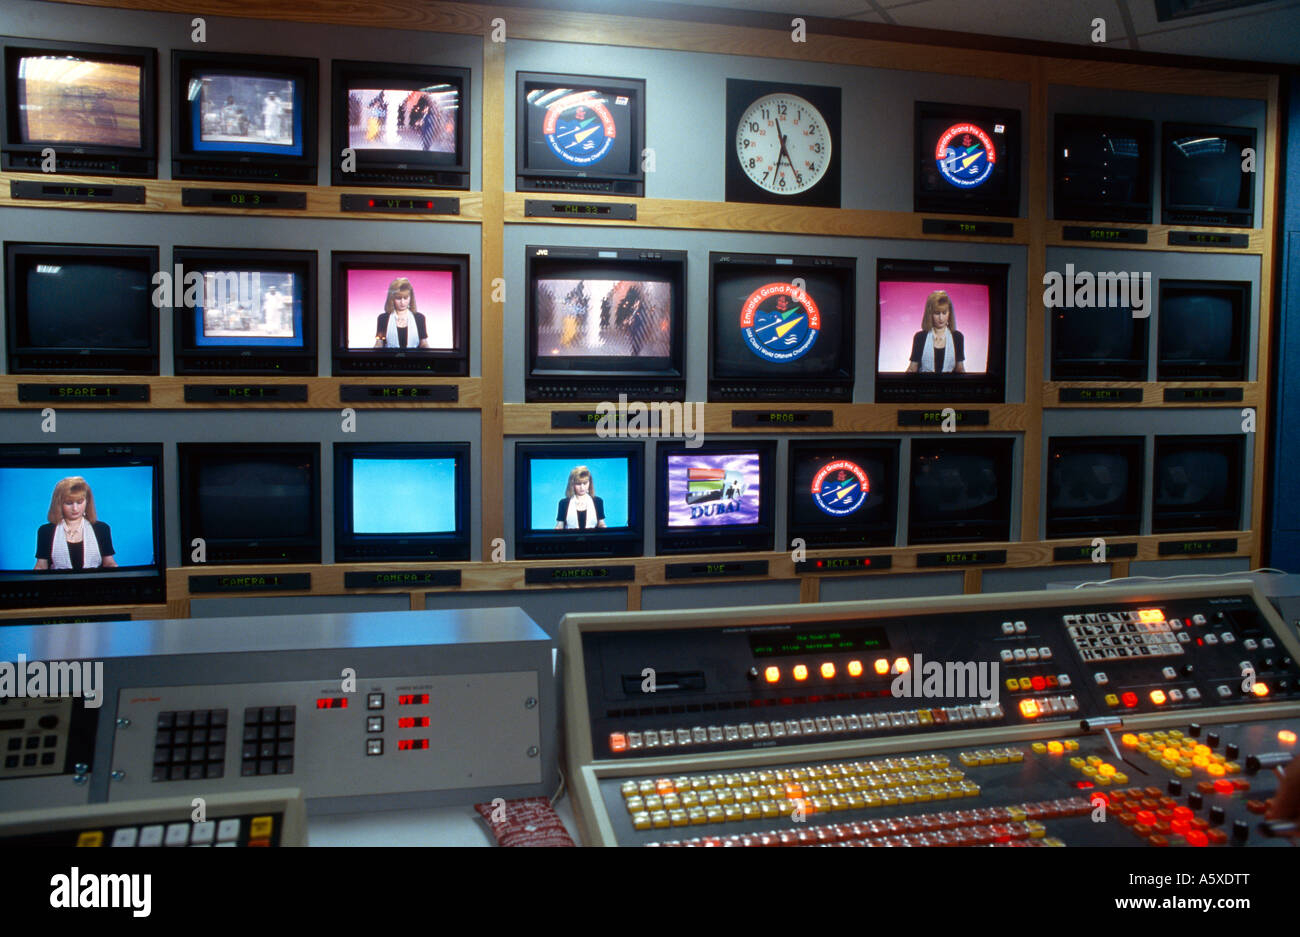 Dubai UAE News Broadcast Television Satellite Channel Control Room ...